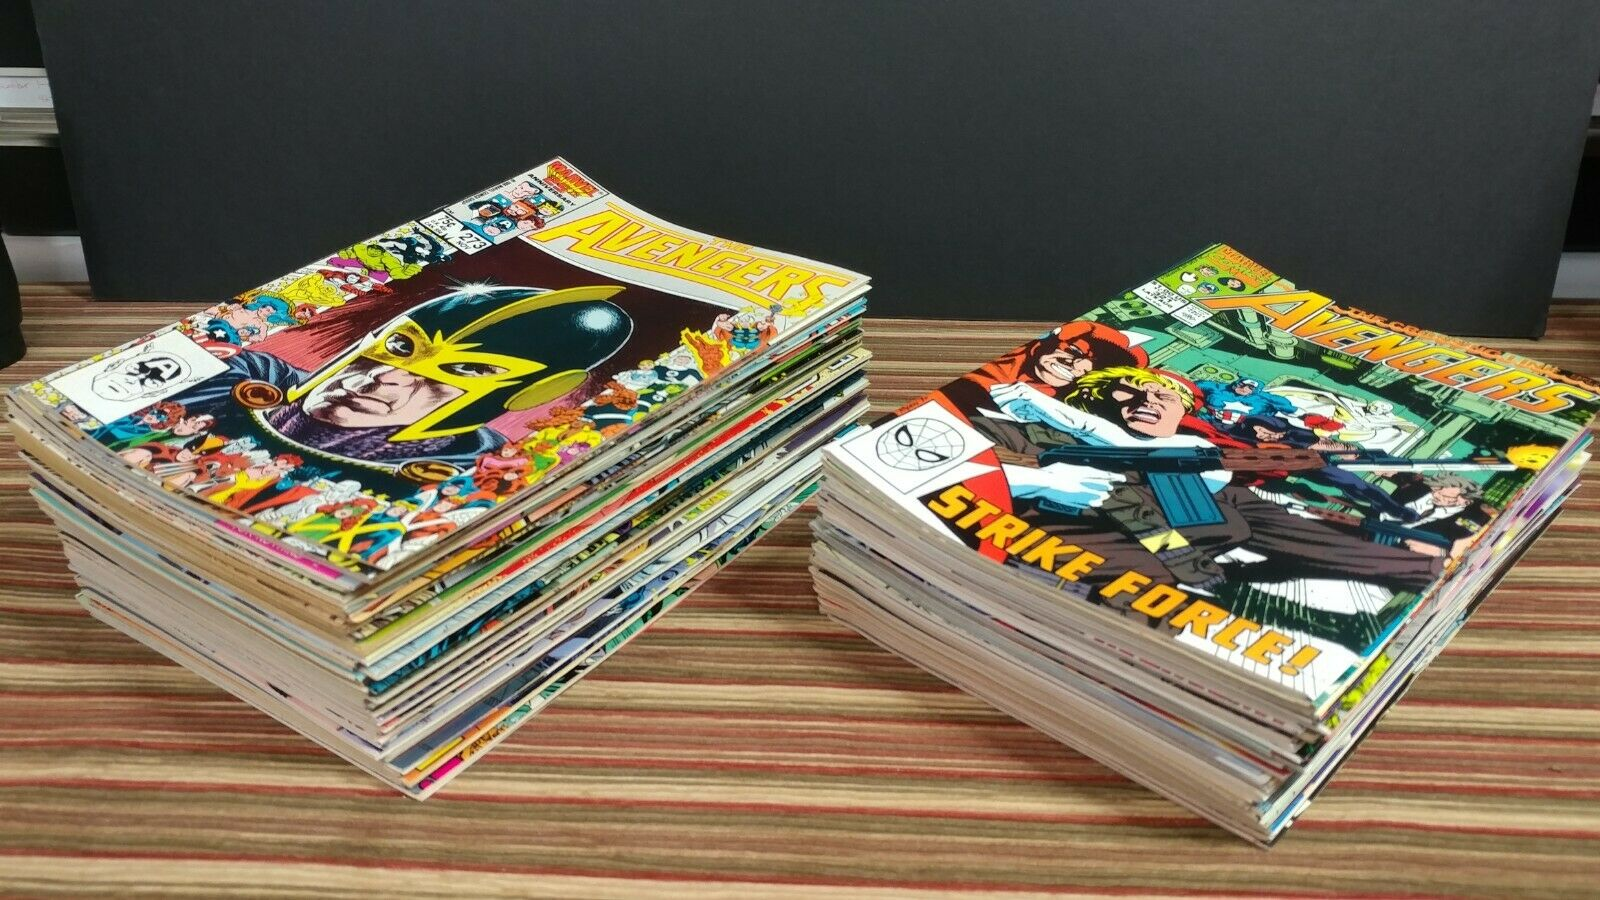 Avengers Lot 273-333, West Coast Avengers 42-57, Avengers Two 1-3, Infinity 1-4.